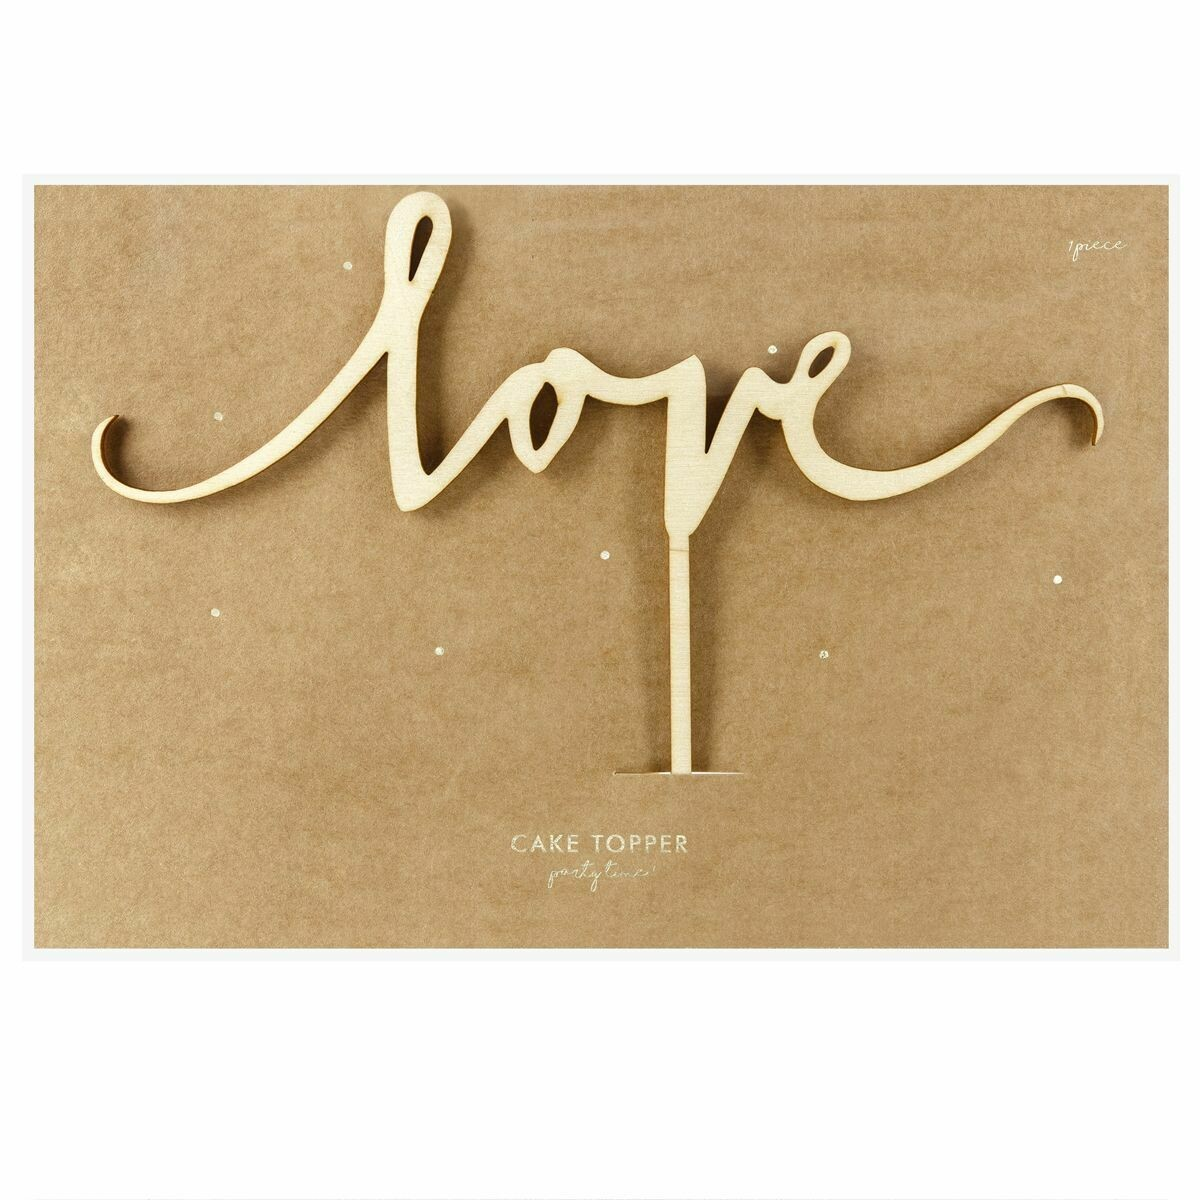 PartyDeco Cake Topper 'Love' - WOODEN -Τόπερ Τούρτας